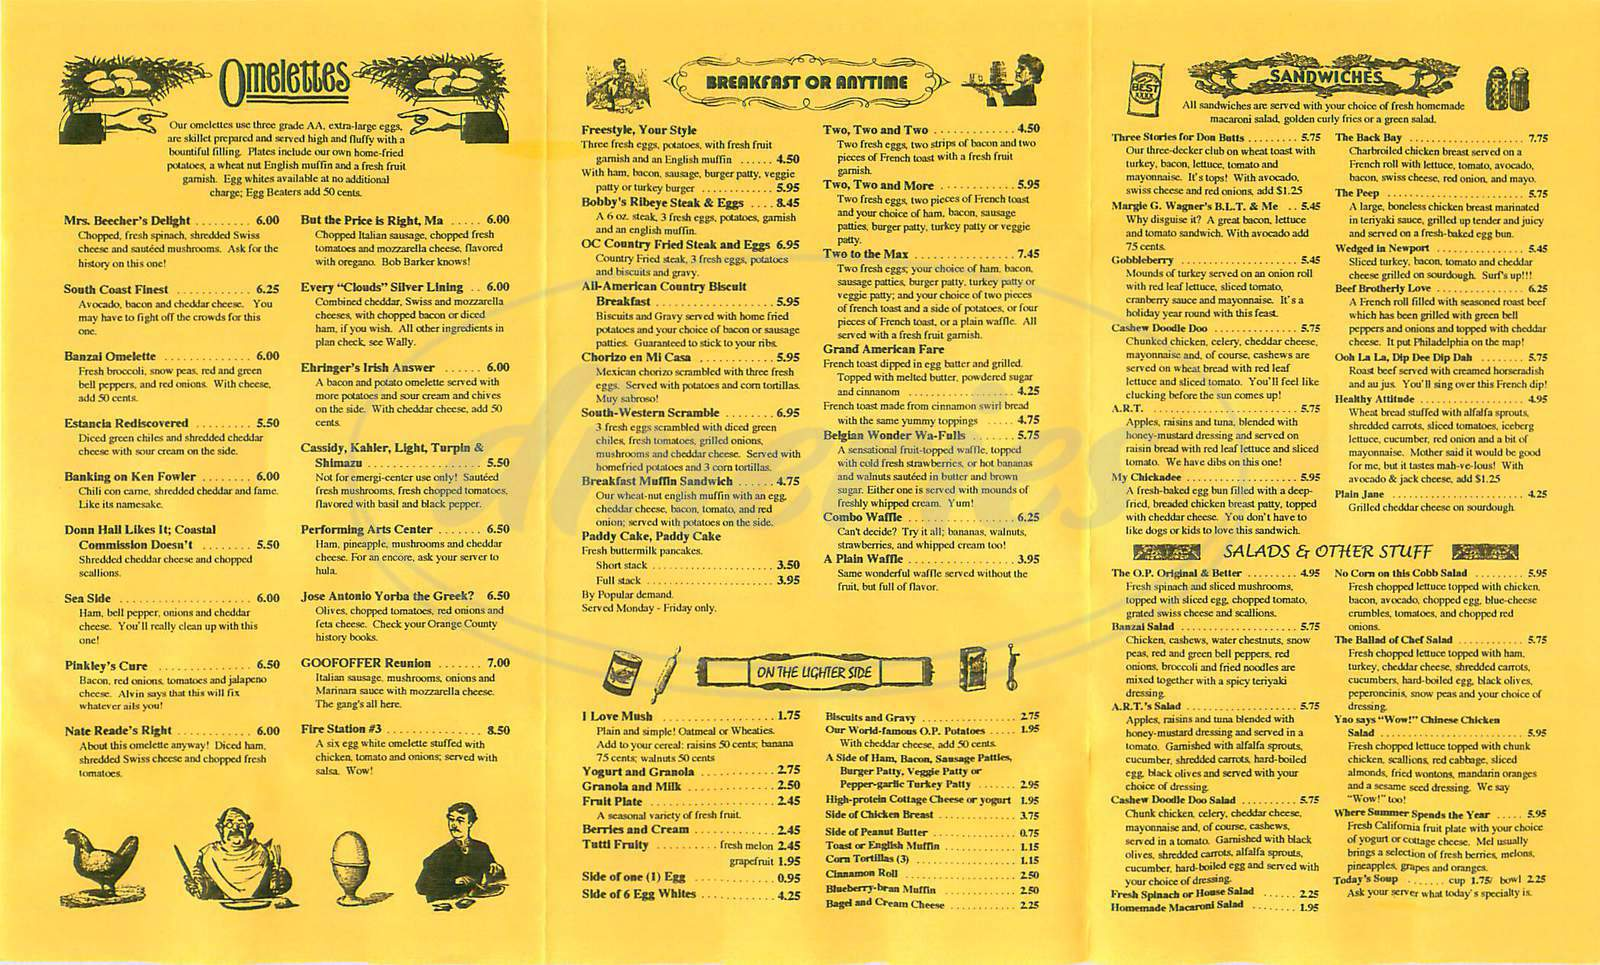 menu for Costa Mesa Omelette Parlor